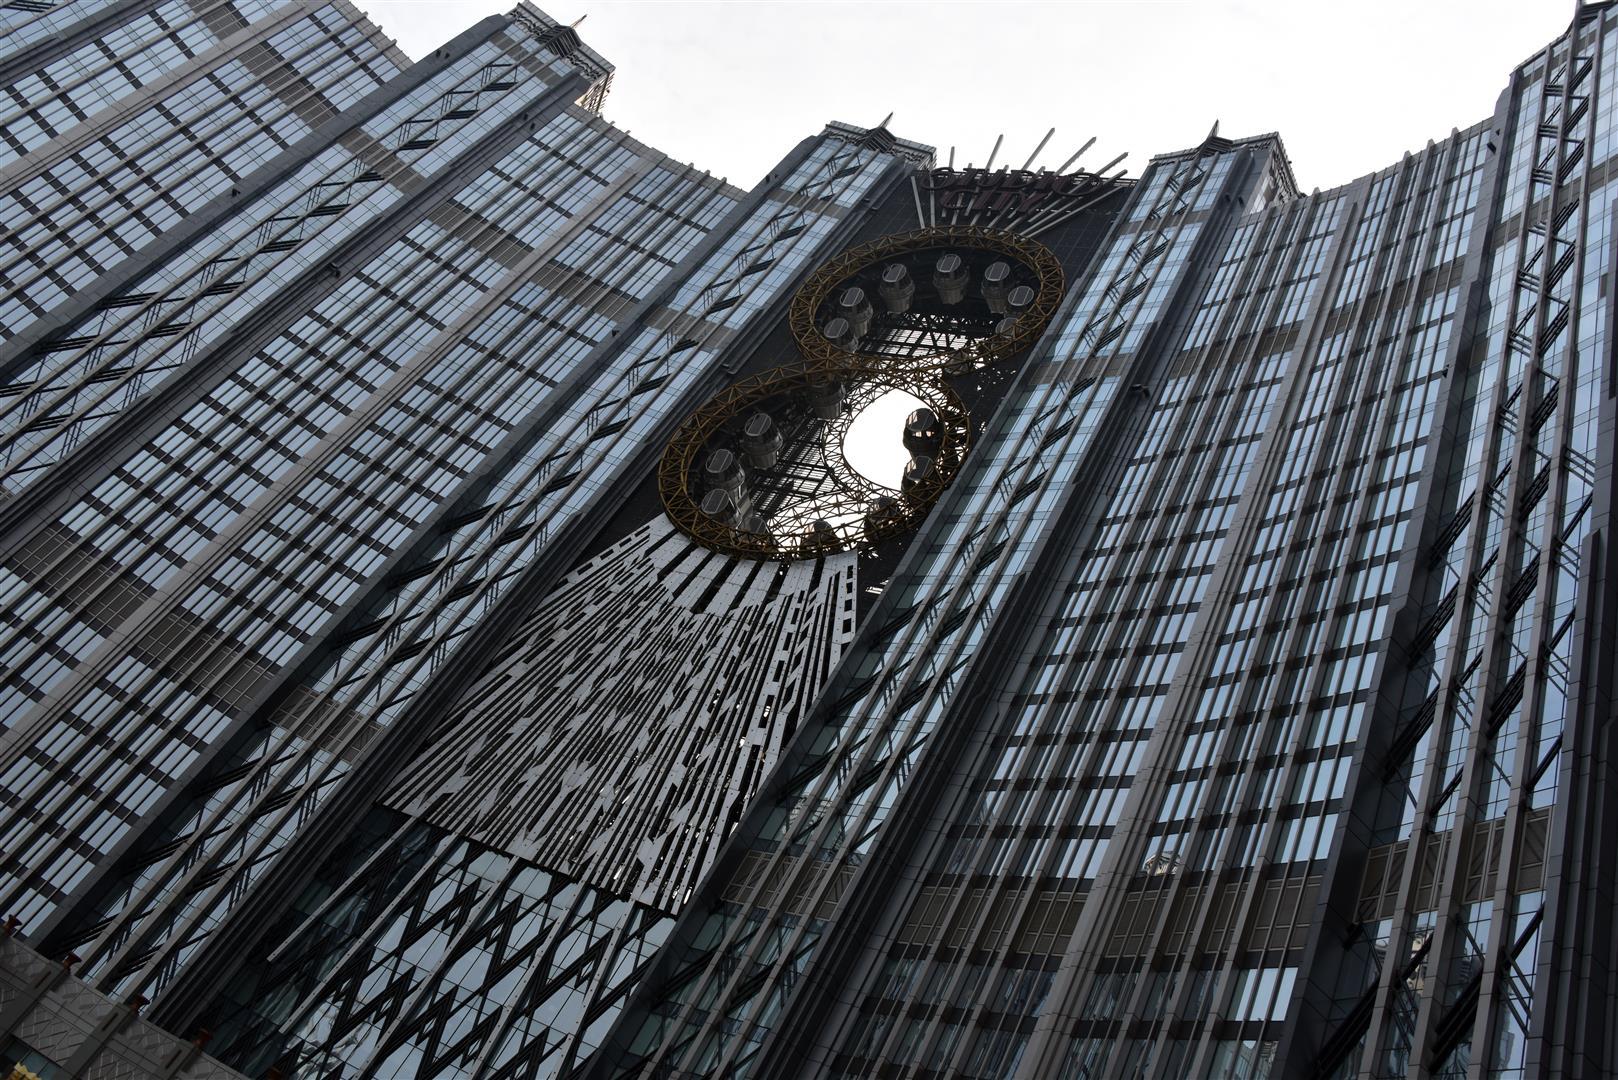 Macau Studio City (1) (Large)